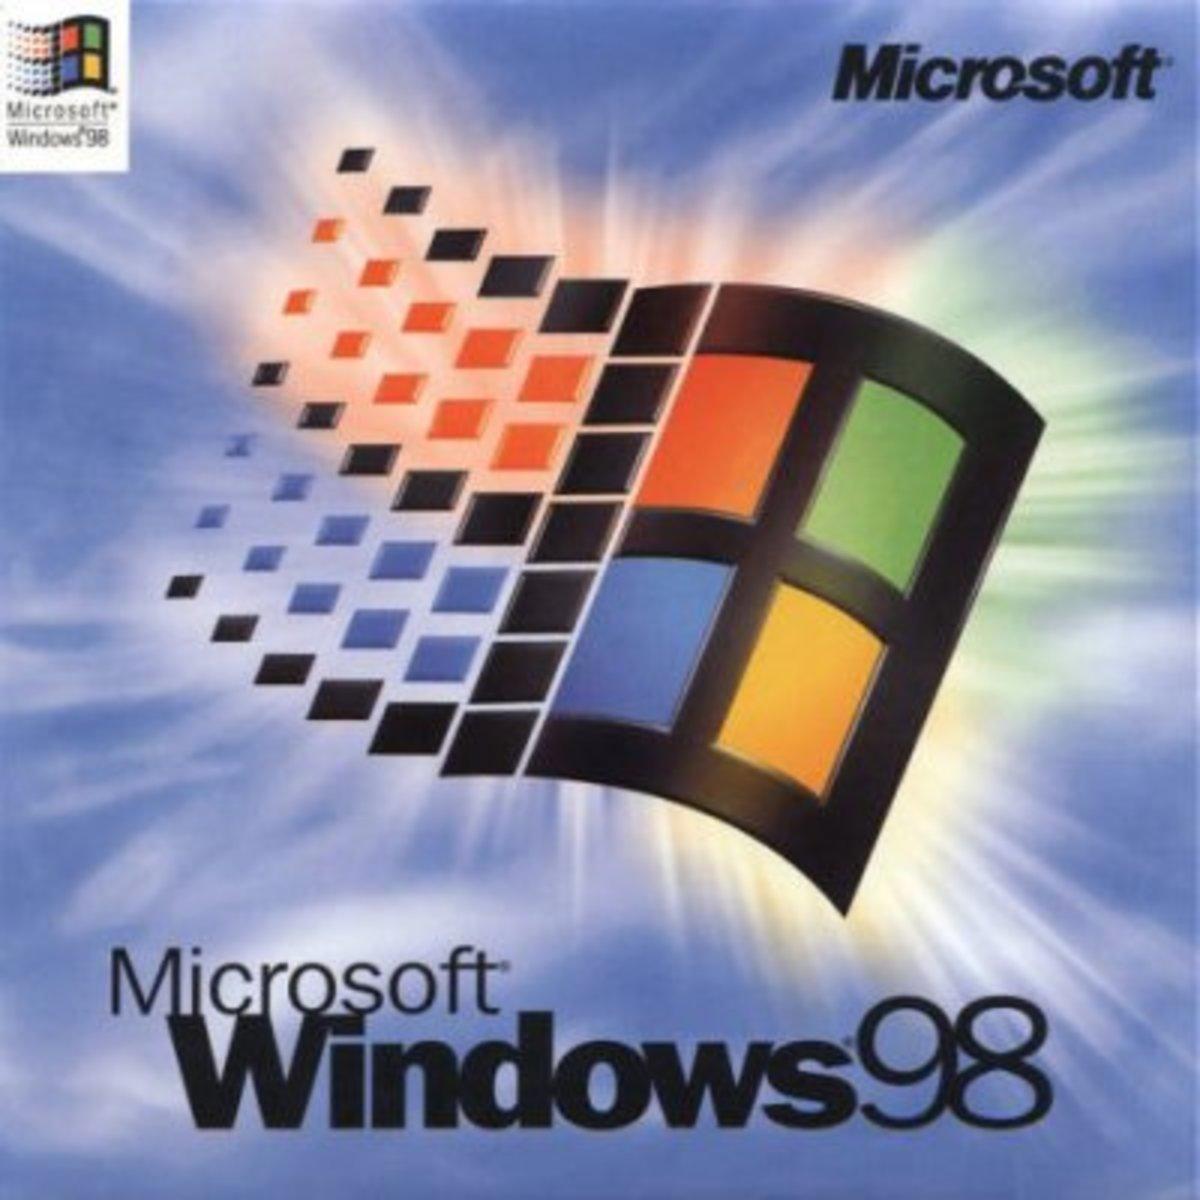 history-of-microsoft-windows